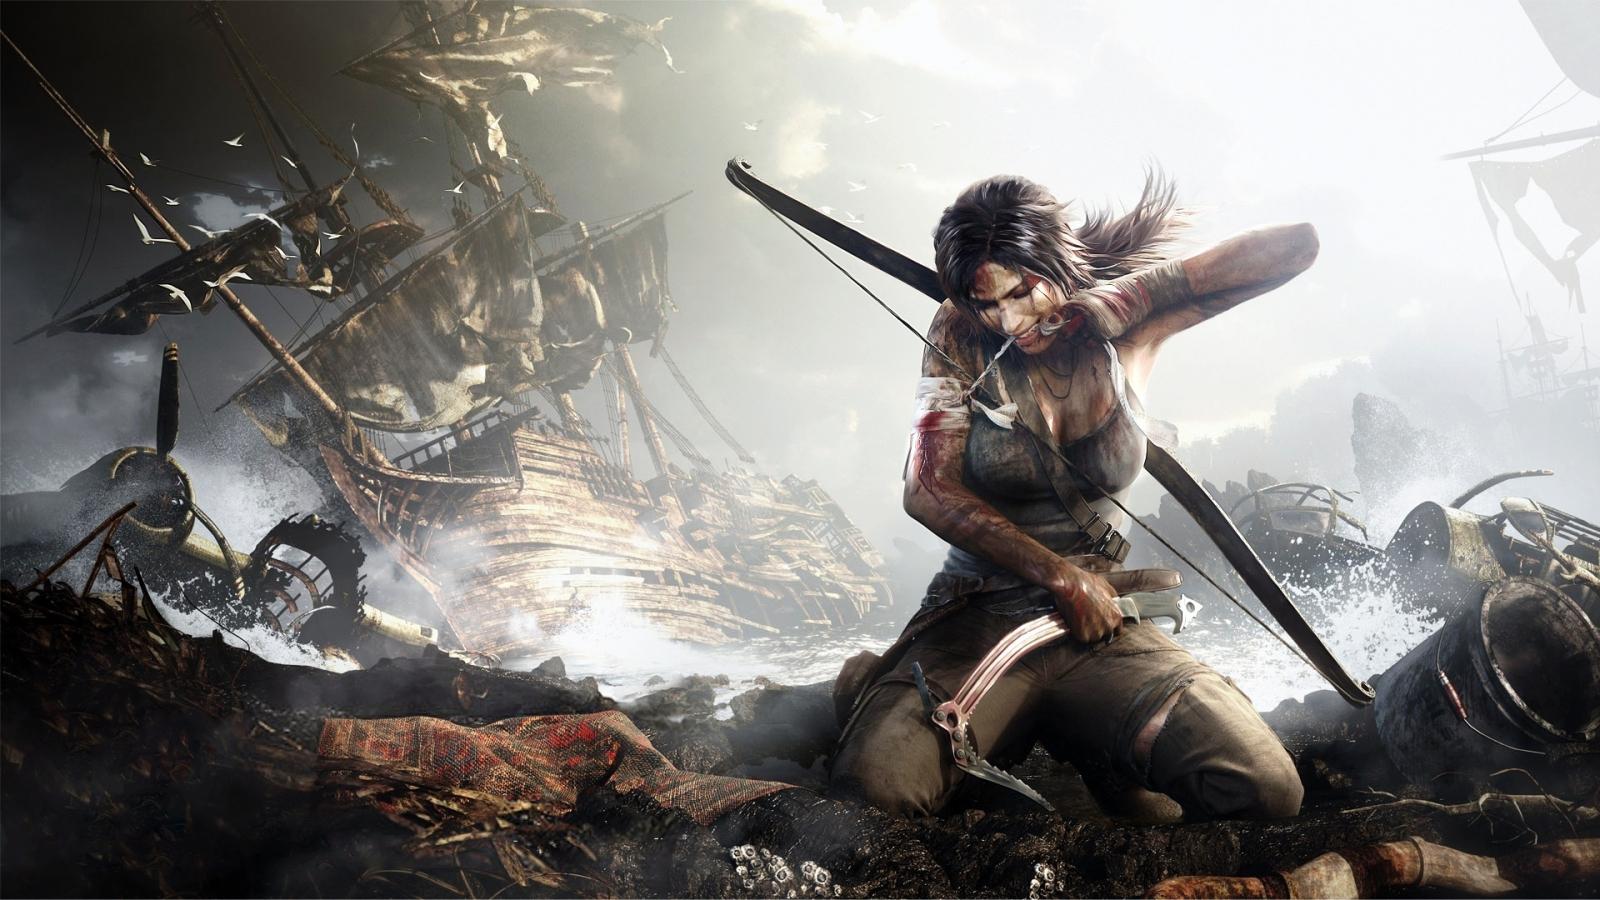 Tomb Raider Definitive Edition Trailer: PlayStation 4